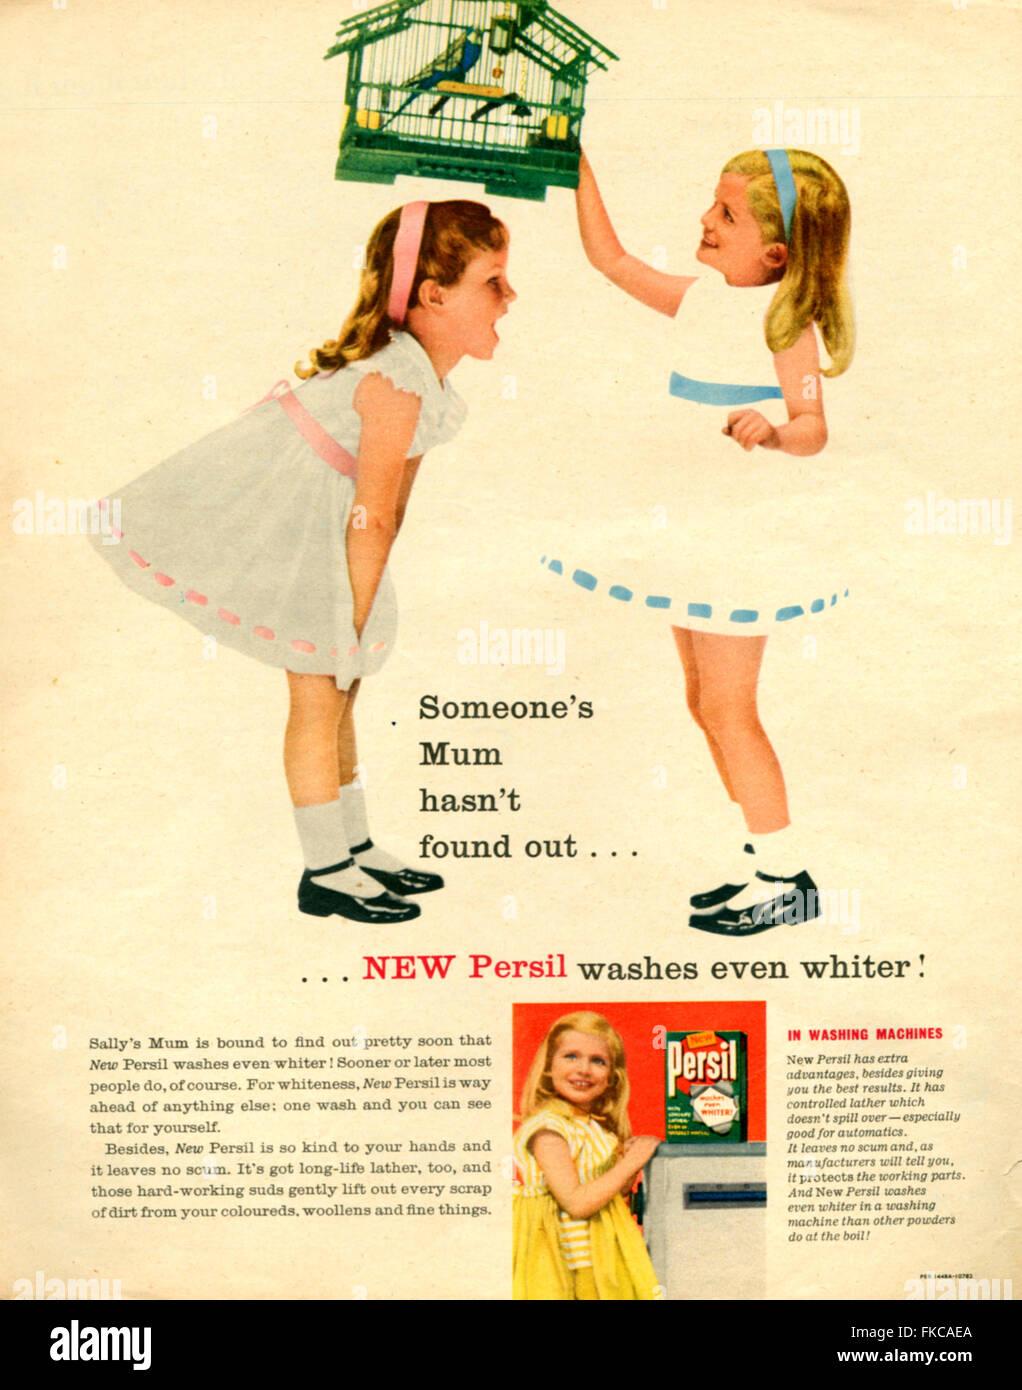 UK Persil Magazine Advert - Stock Image